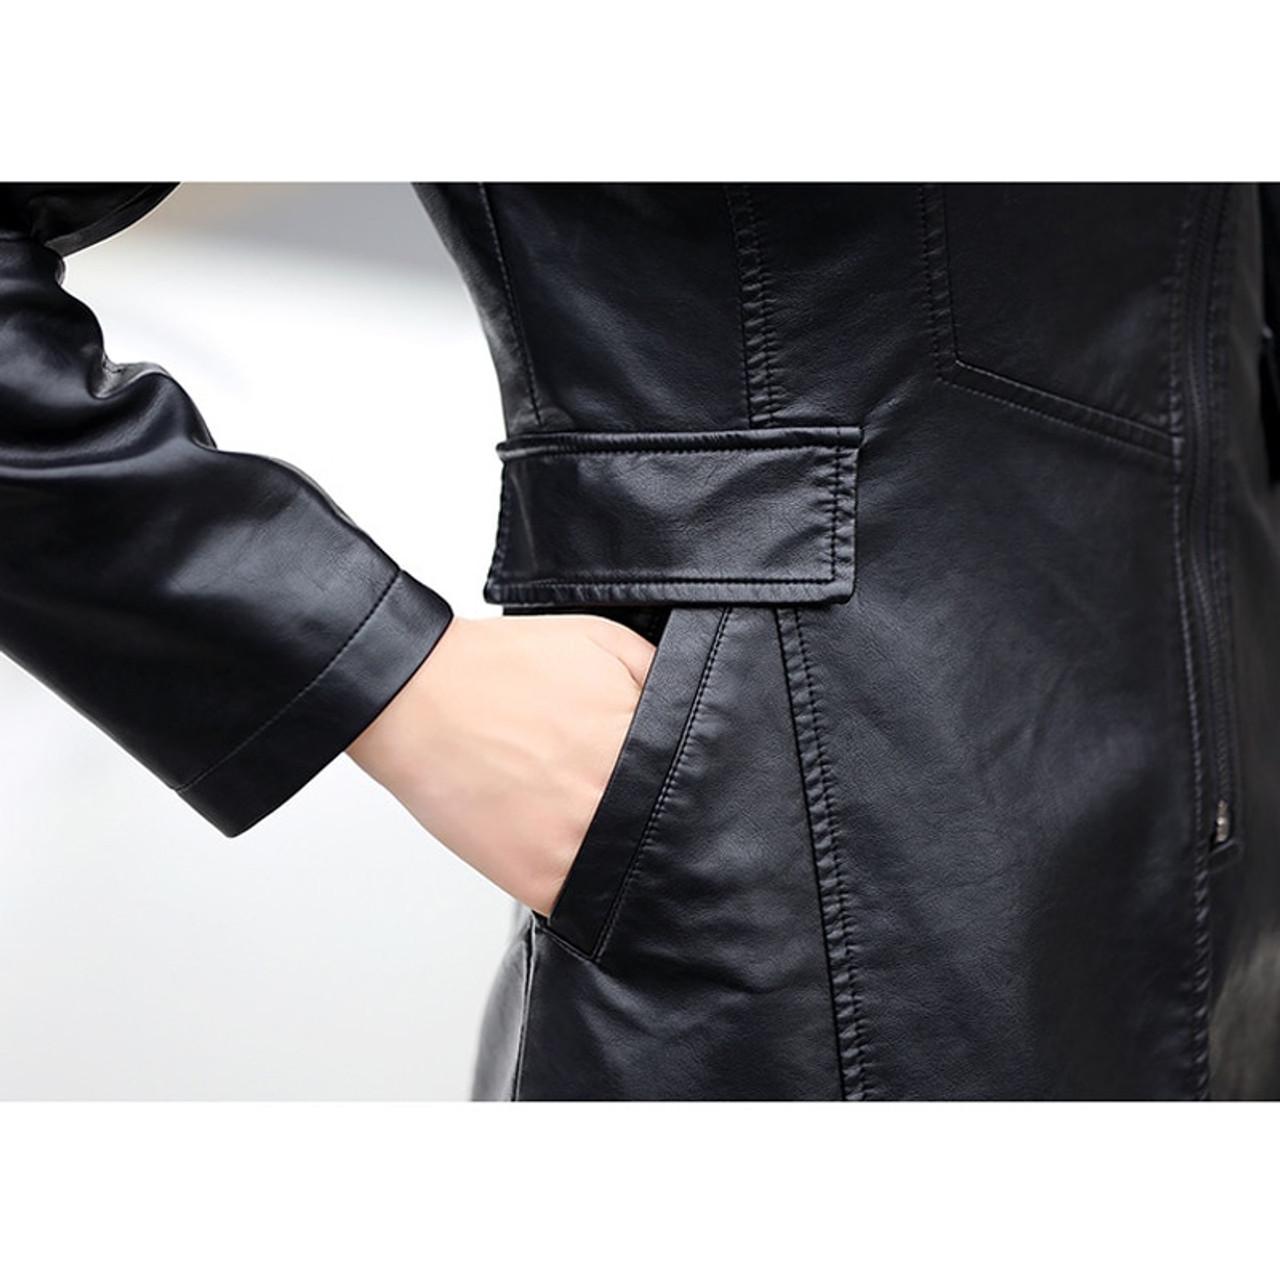 772971d2be12b ... Smiao 2018 Autumn Female Leather Jacket Winter Plus Size 5XL Long Coat  Female Zipper PU Faux ...